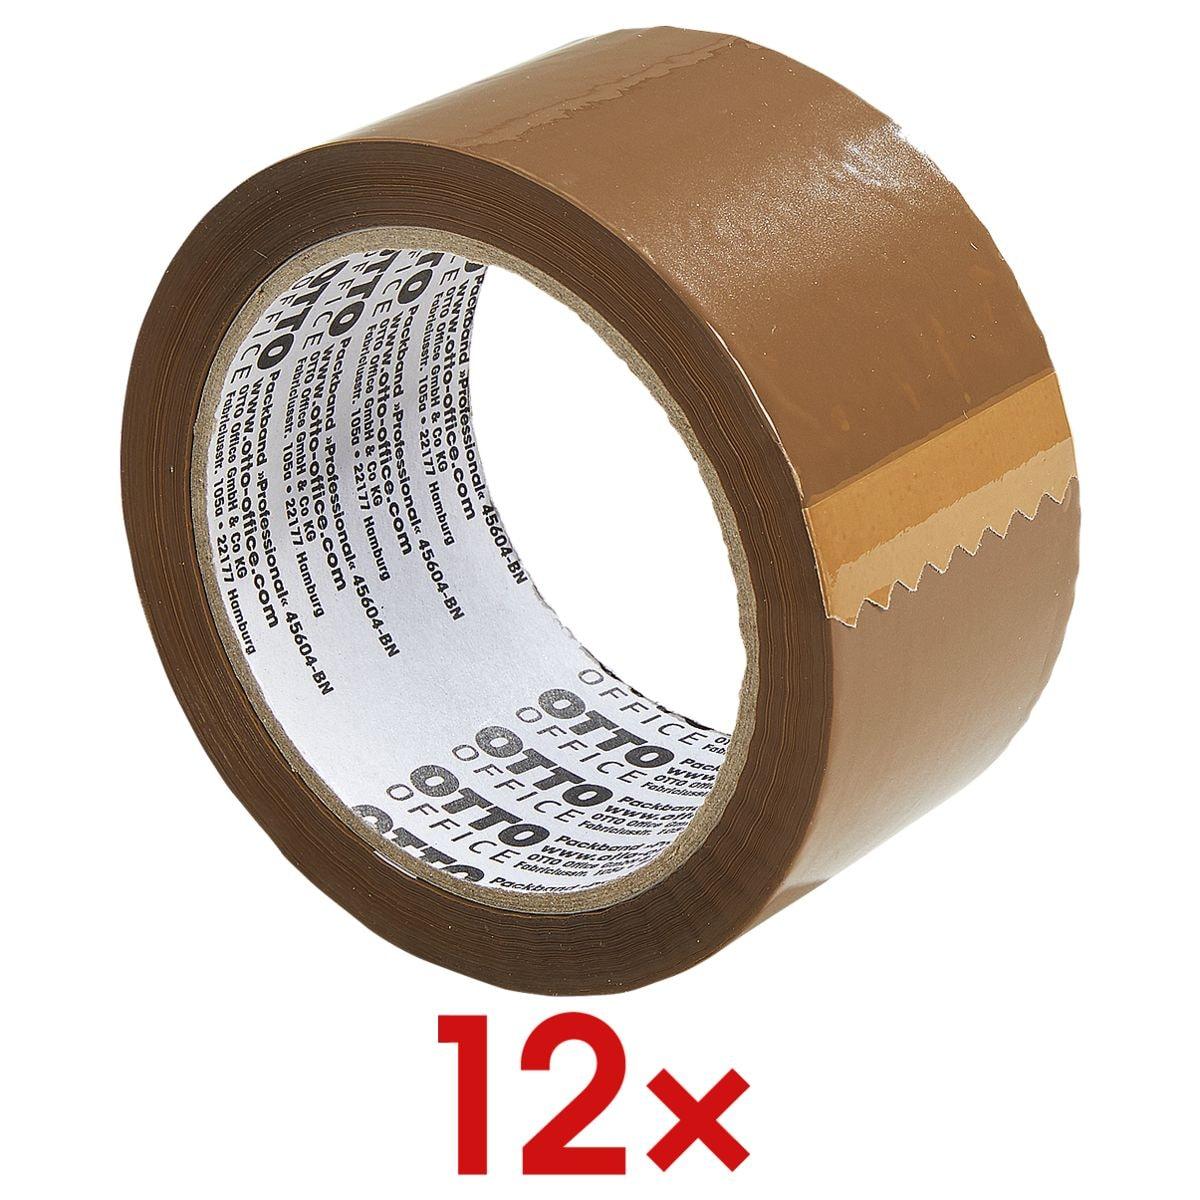 12x Packband OTTO Office Professional, 50 mm breit, 66 Meter lang - mittellaut abrollbar